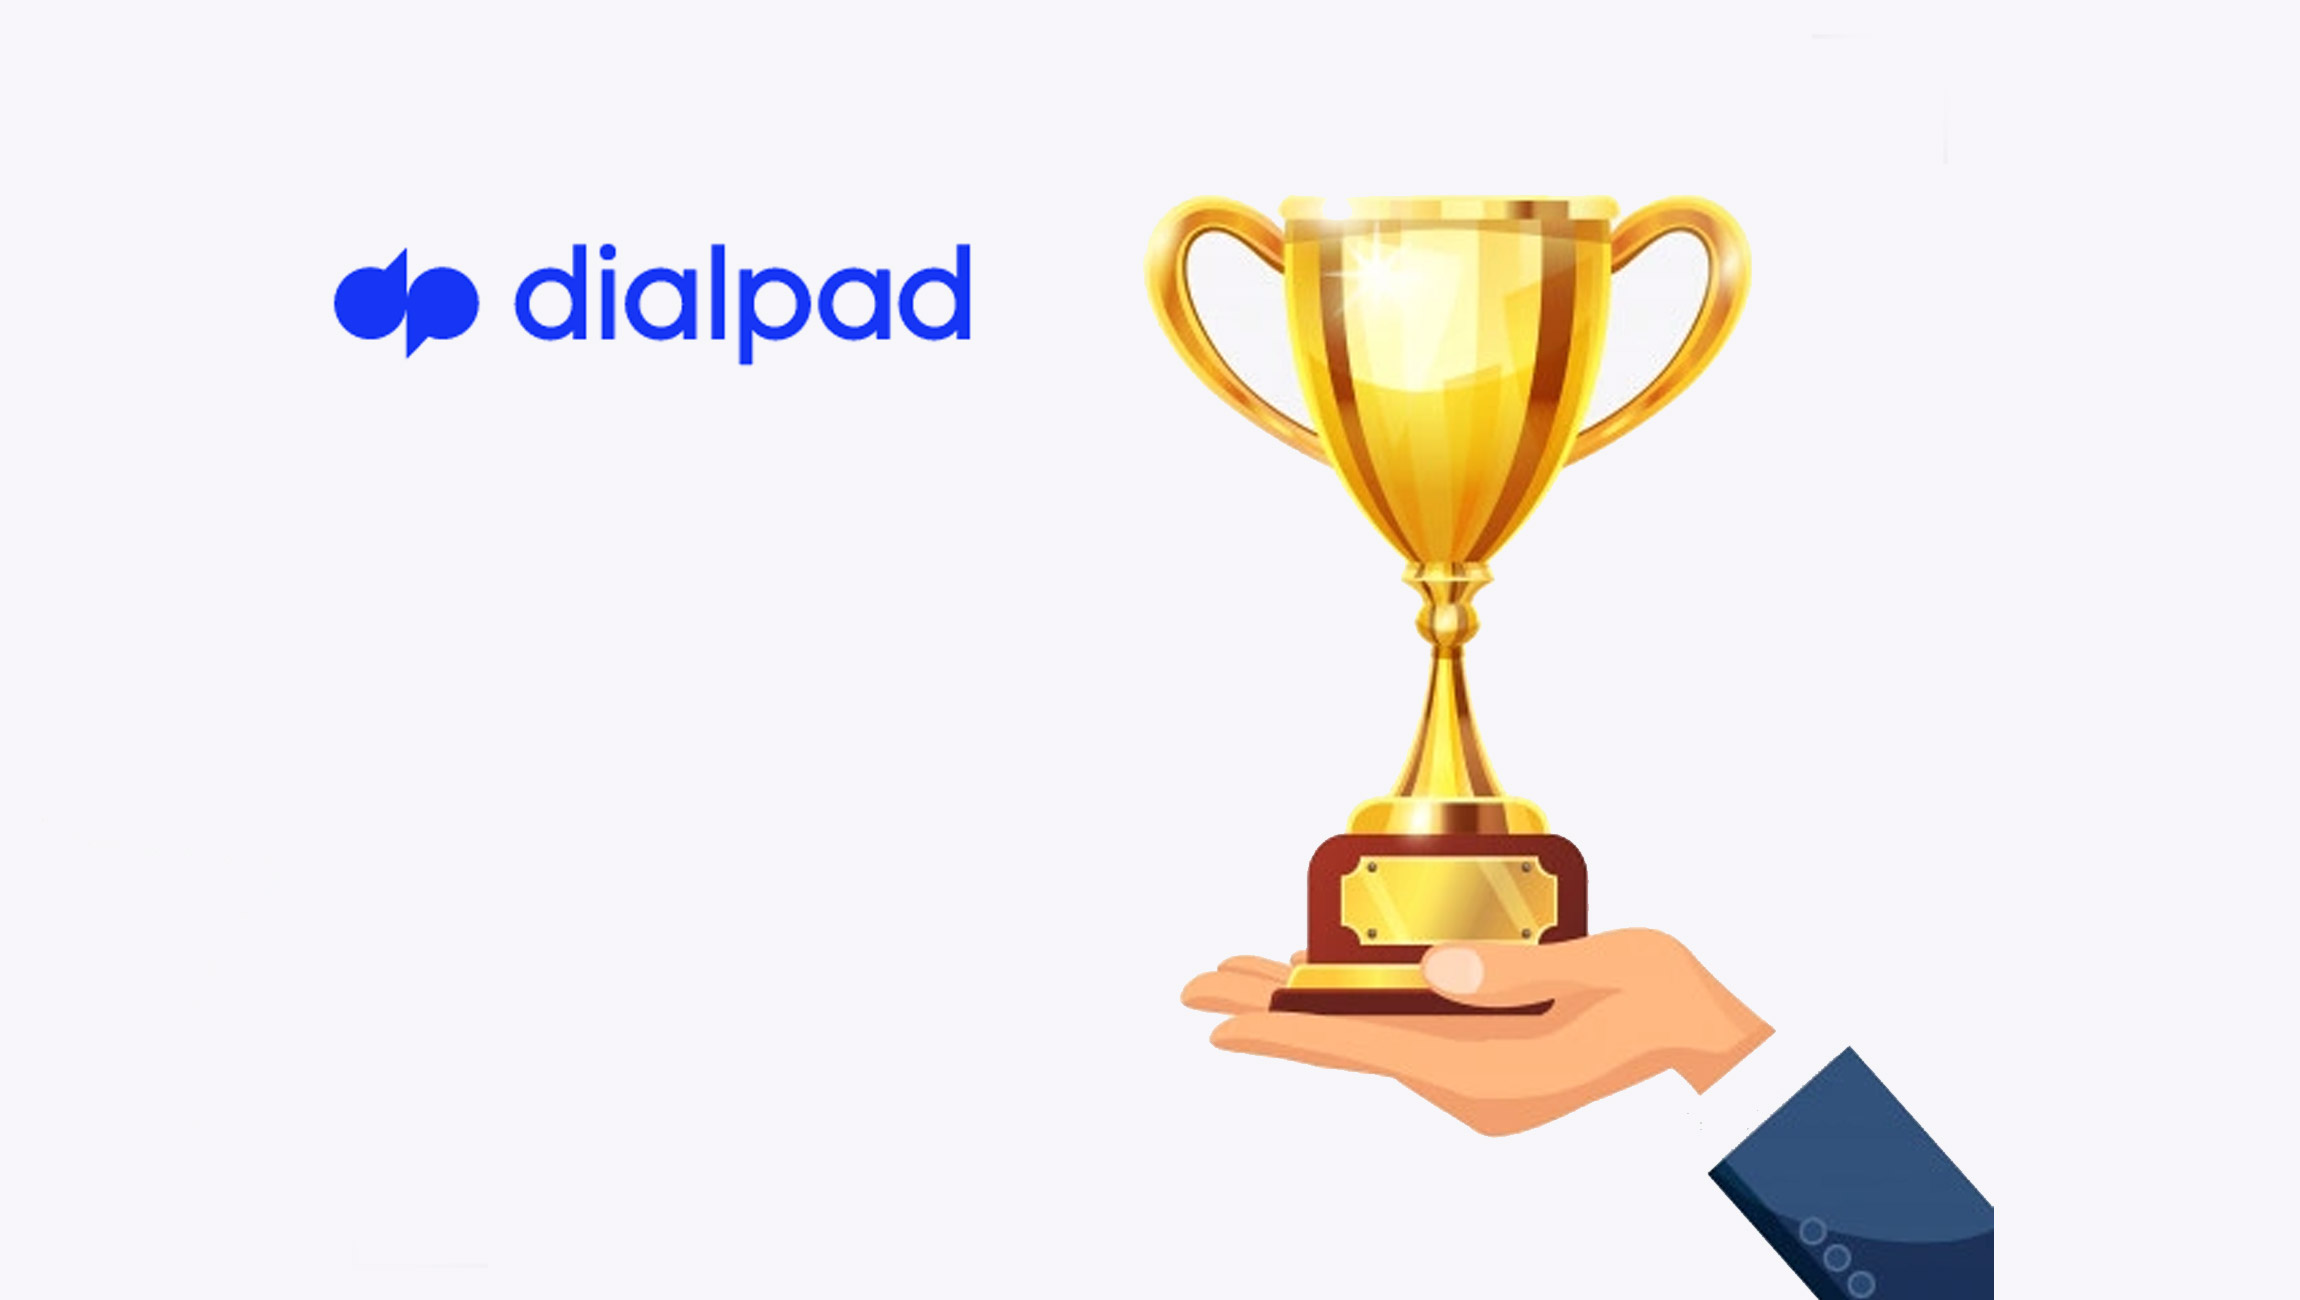 Dialpad Wins 2021 Top Rated Awards From TrustRadius 1